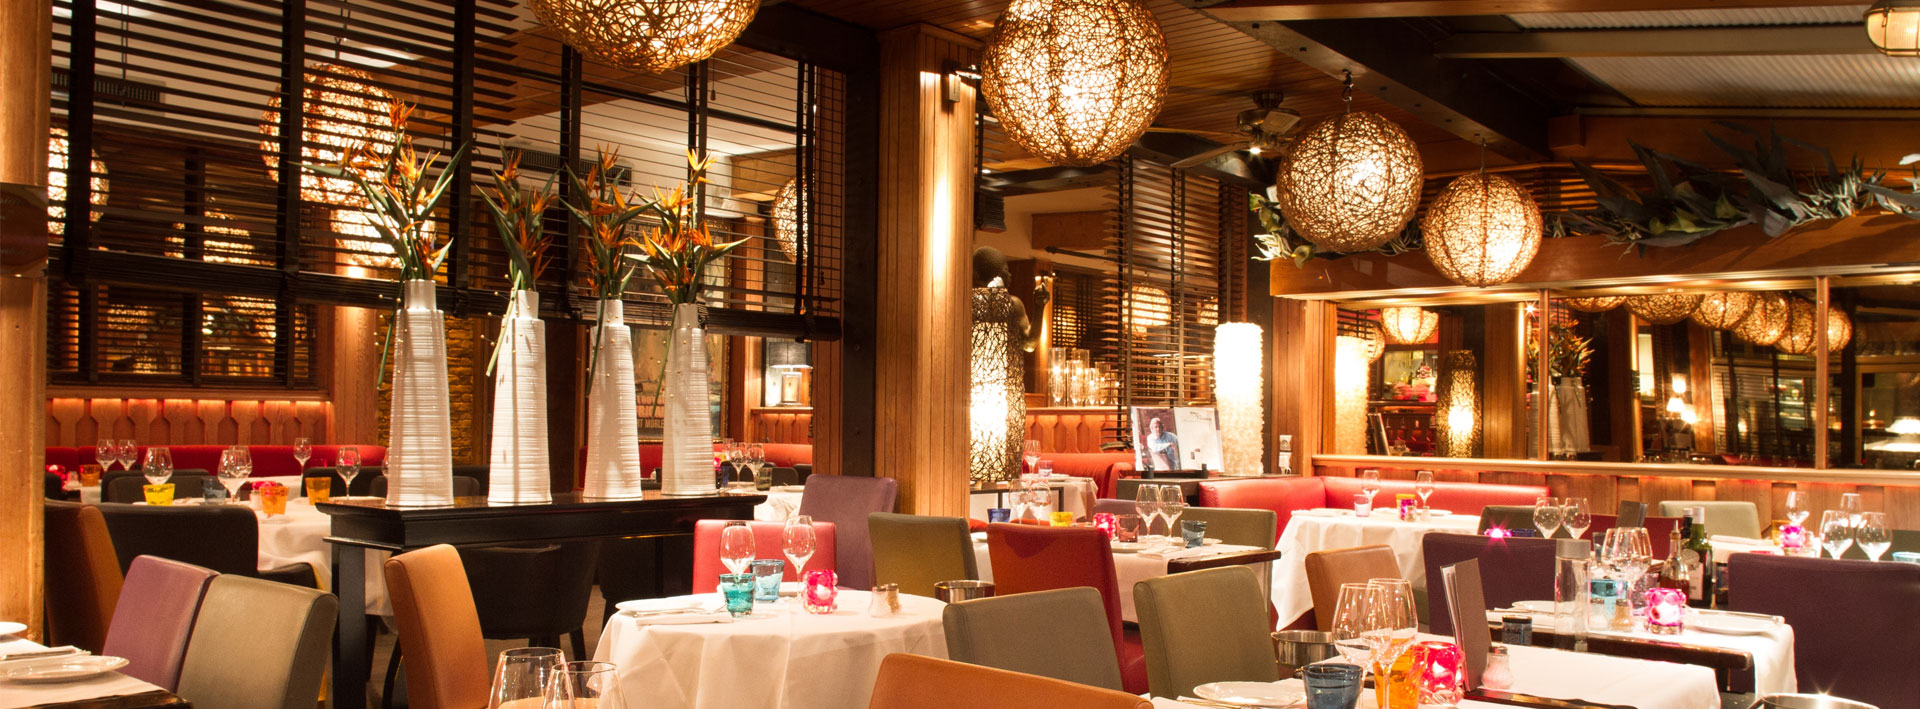 Restaurant Fitouts